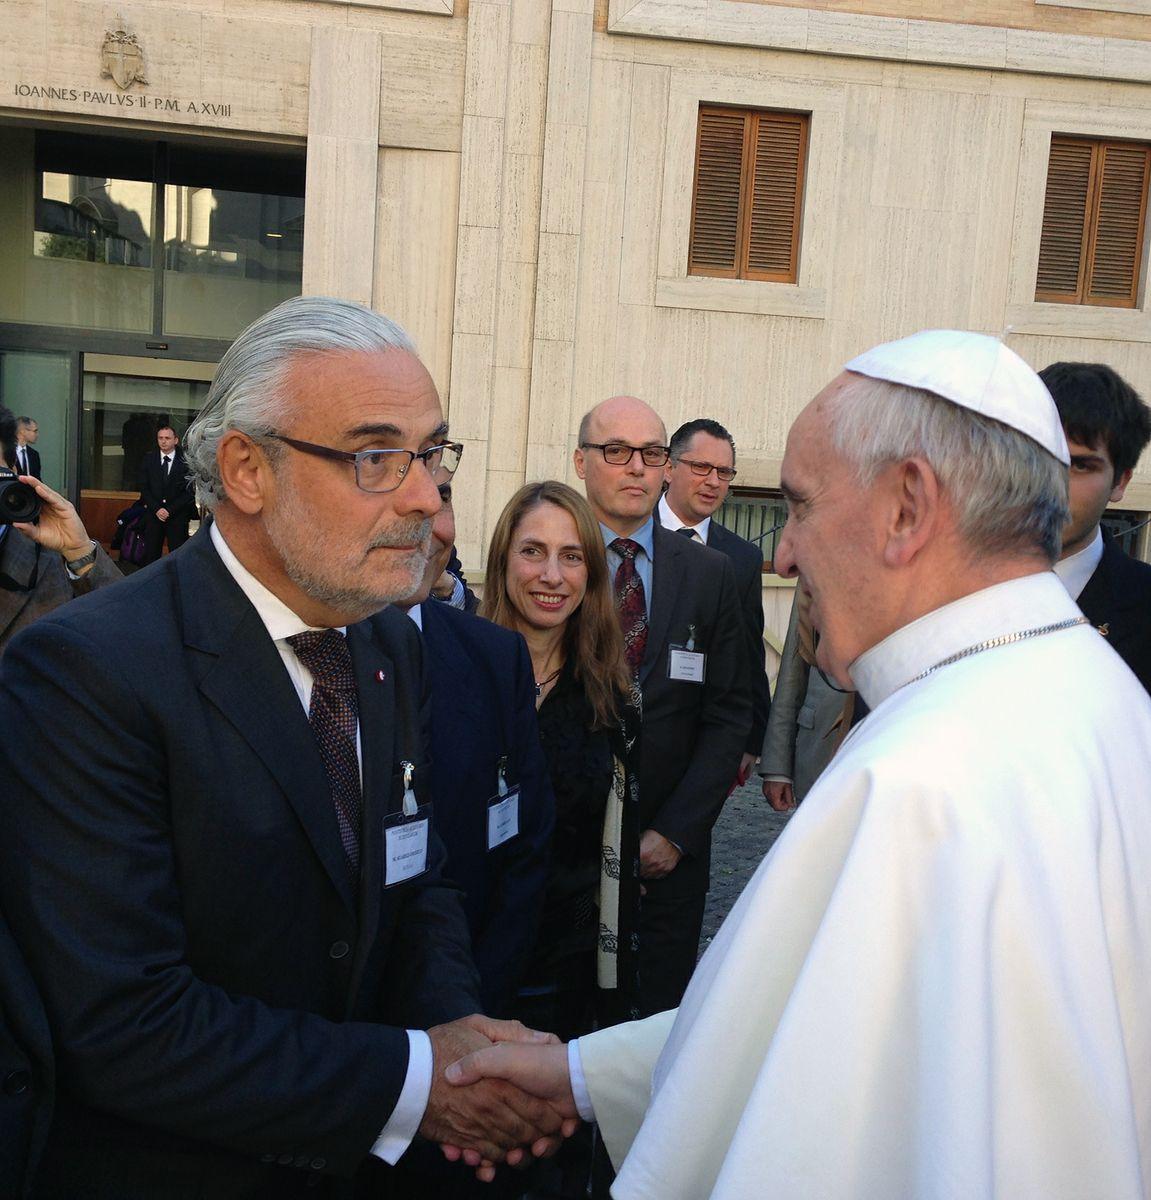 Marcelo Suárez-Orozco and Pope Francis